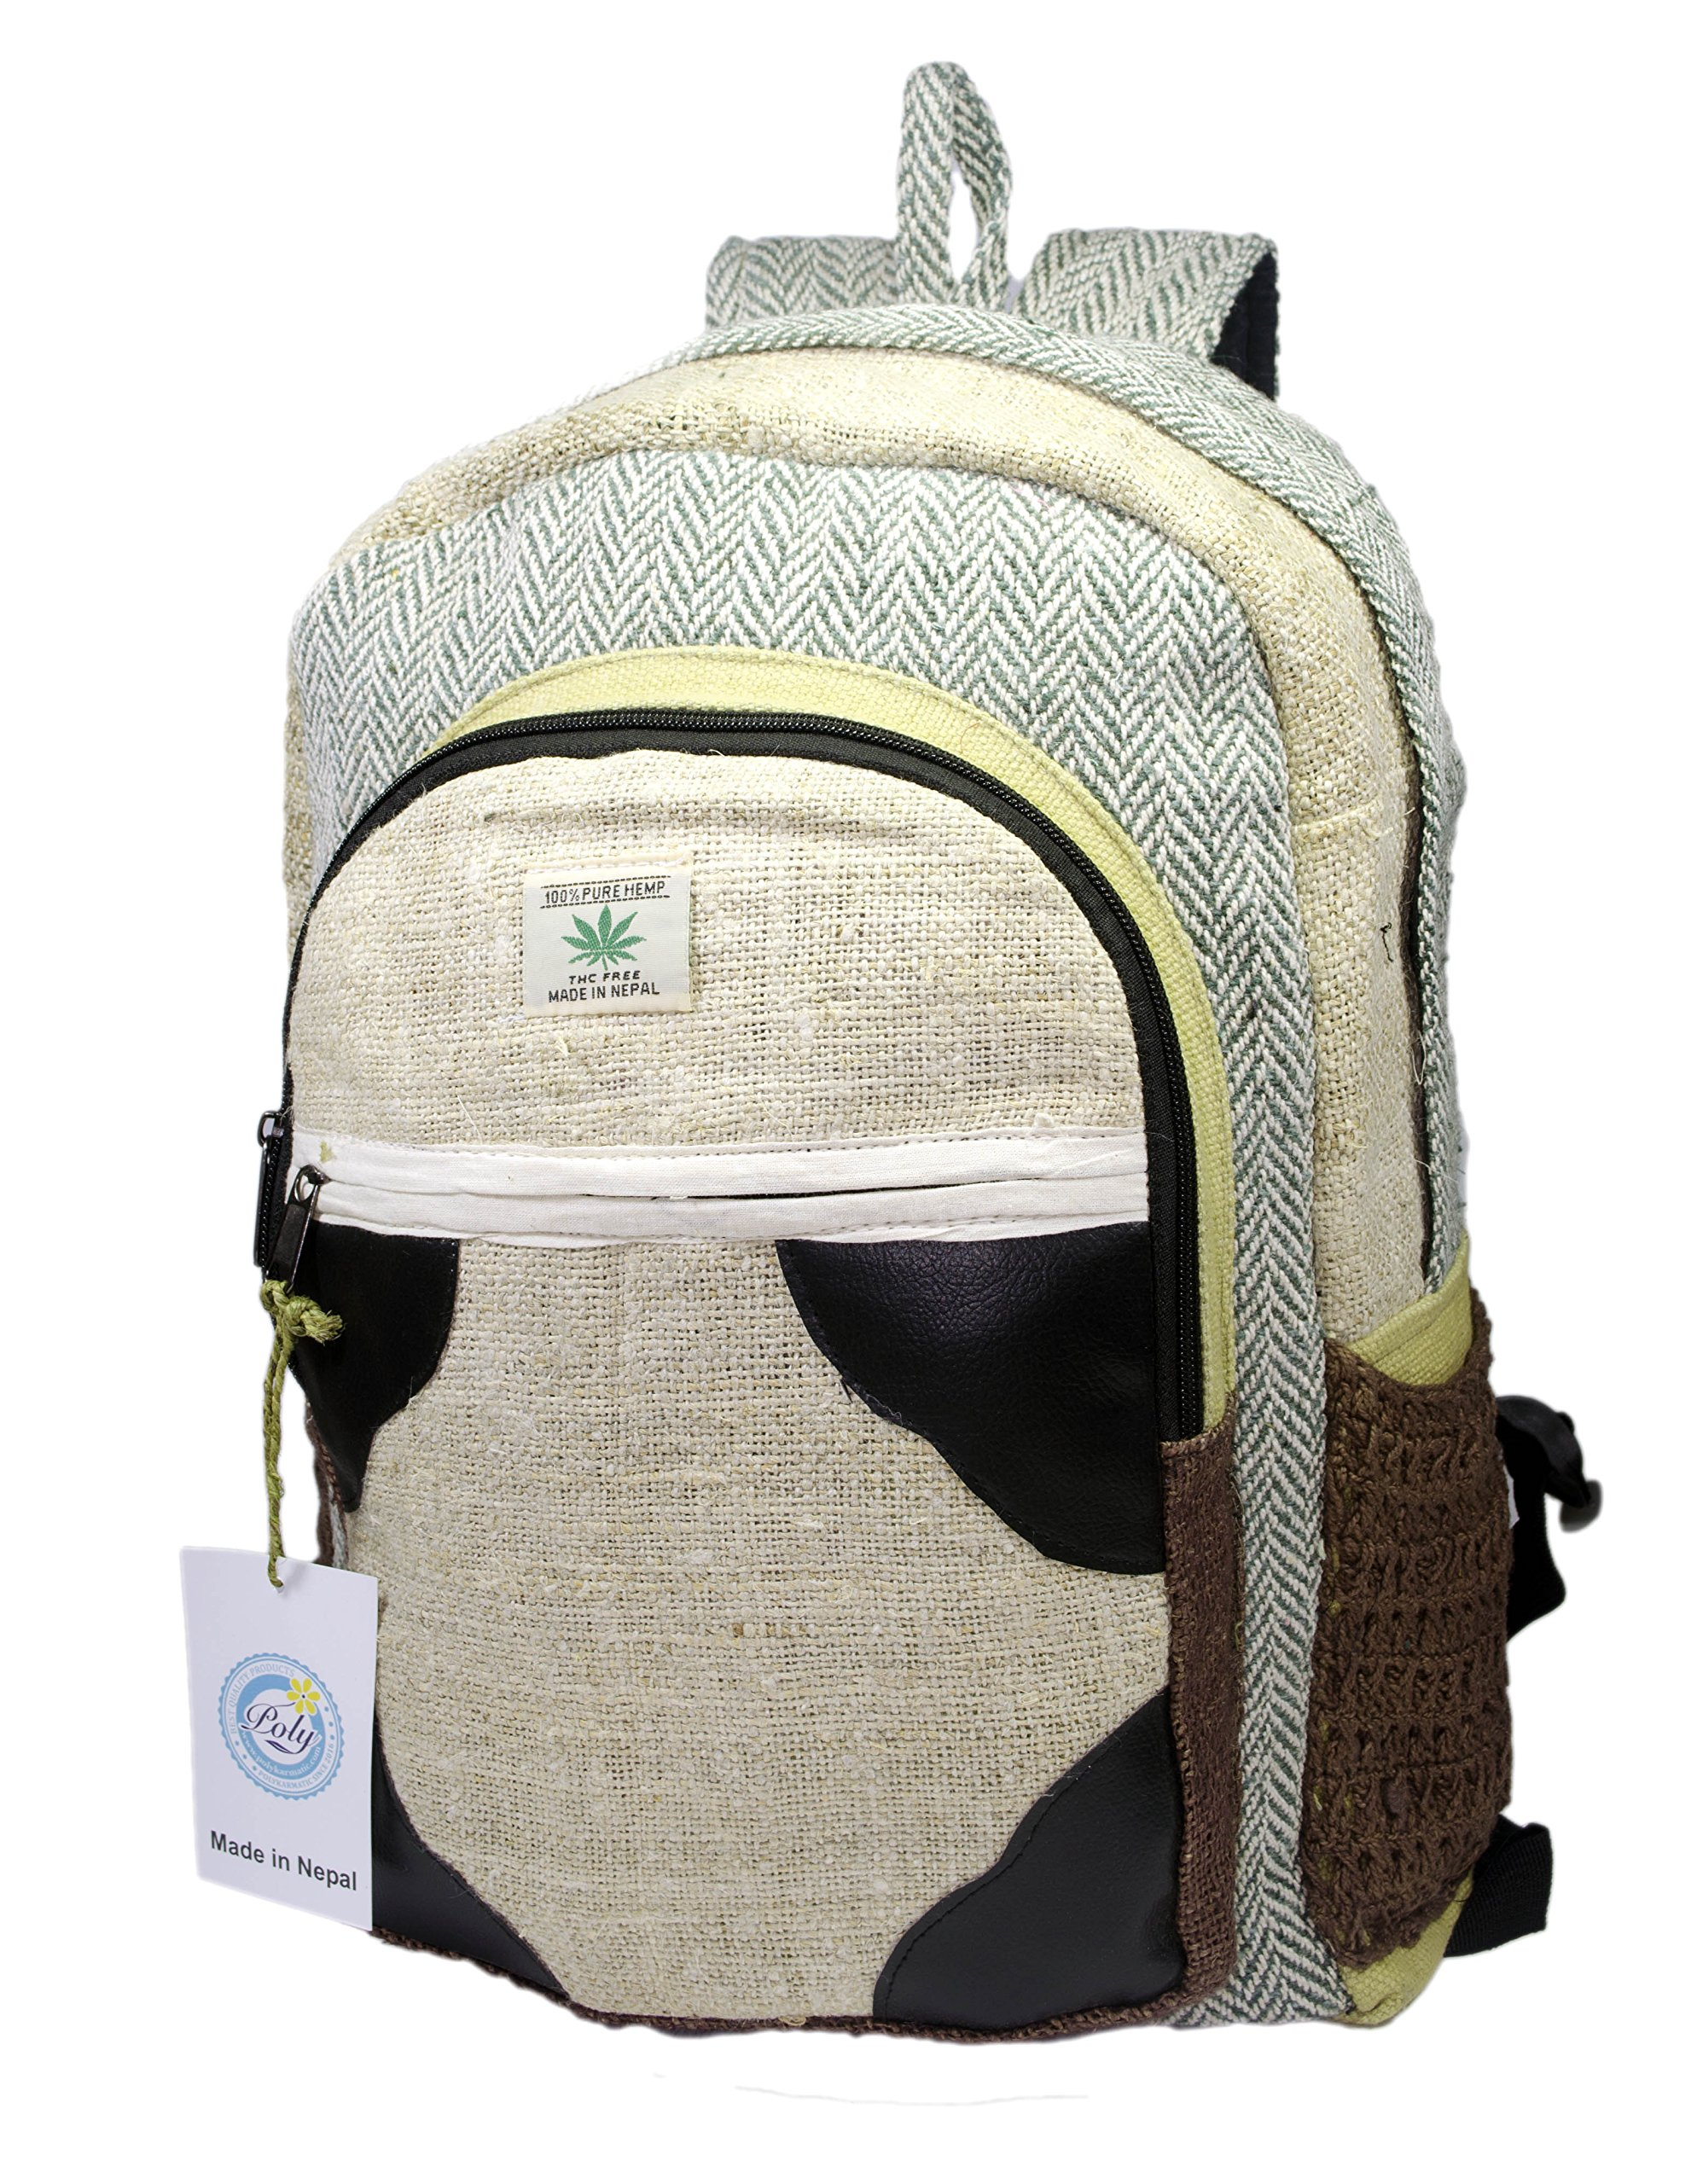 Hemp Handmade Himlayan Backpack ( THC FREE) (Type 1) by Polykarmatic (Image #1)